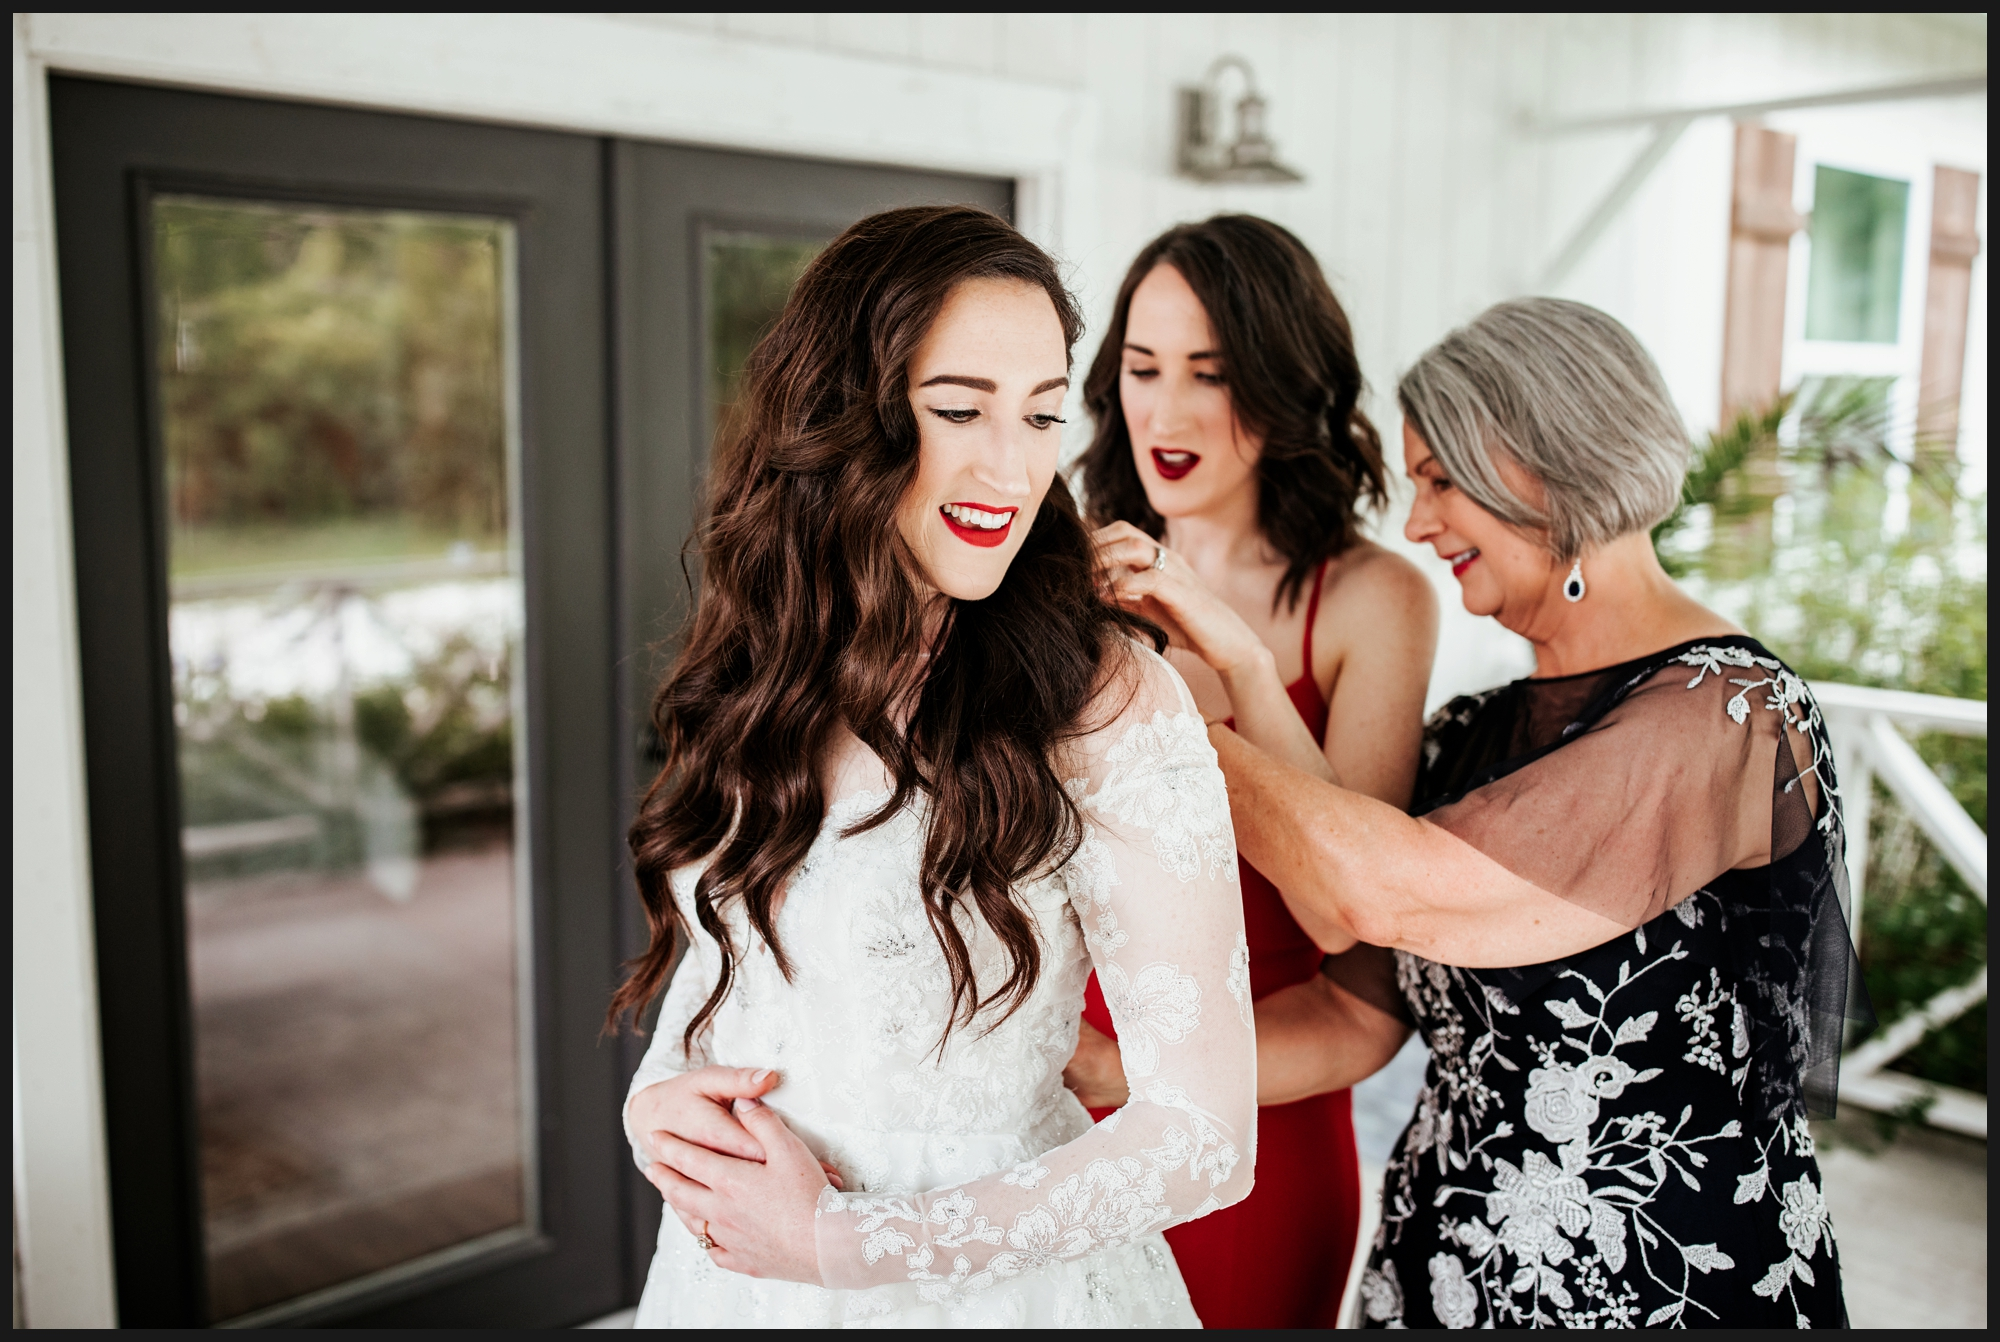 Orlando-Wedding-Photographer-destination-wedding-photographer-florida-wedding-photographer-hawaii-wedding-photographer_0500.jpg